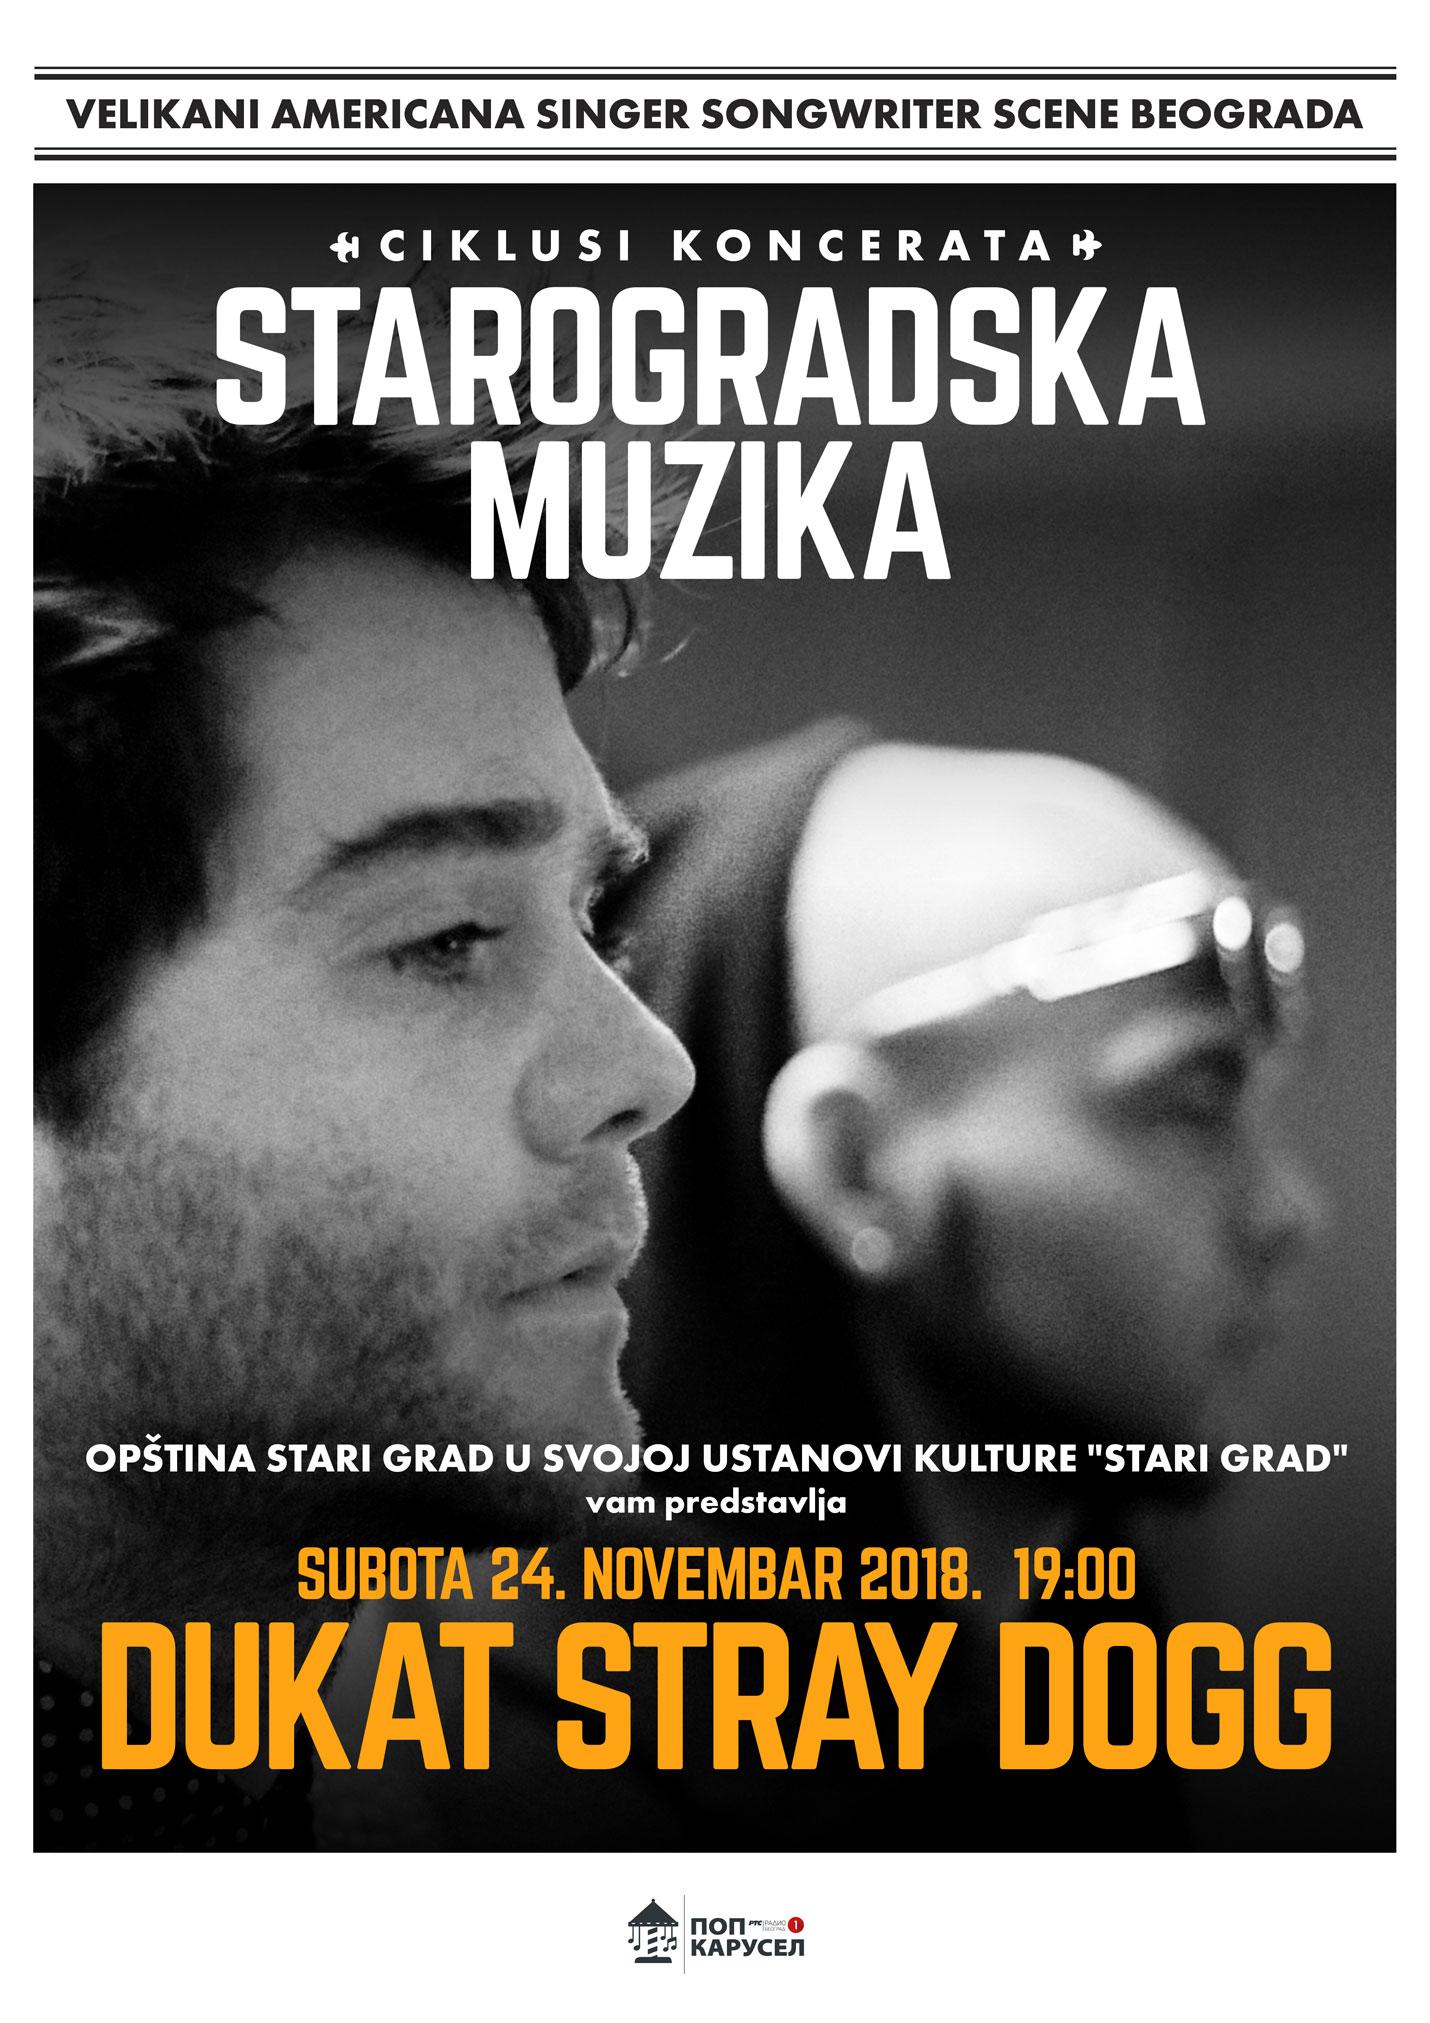 Dukat Stray Dogg – Starogradska muzika u savremenom aranžmanu